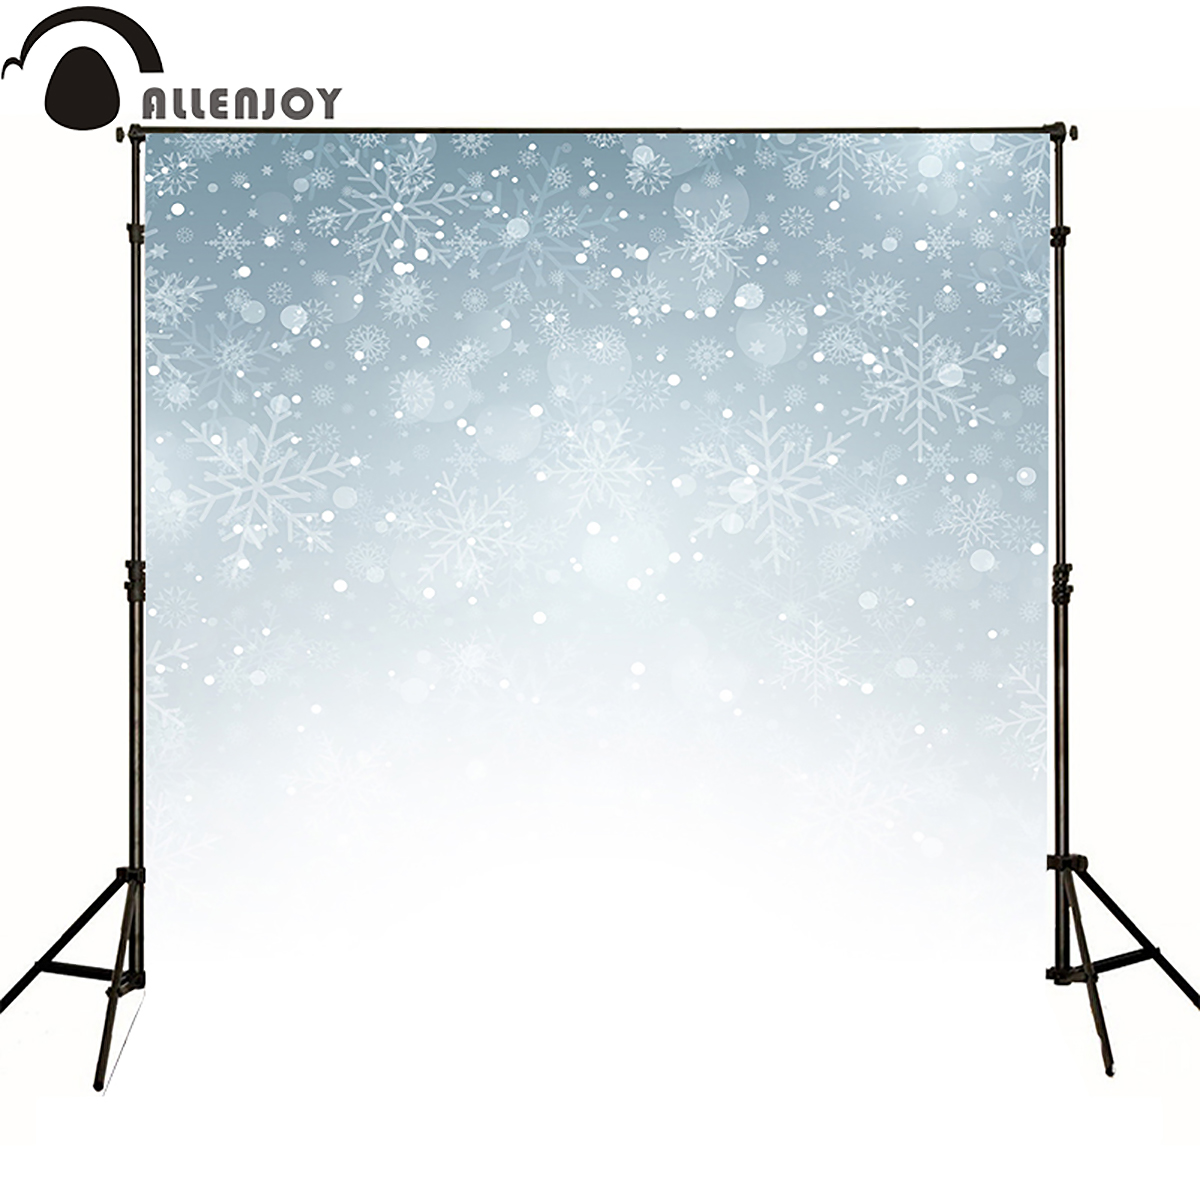 Allen joy christmas photography backdrops abstract bokeh blur xmas snowflake silver newborn baby shower sale home party